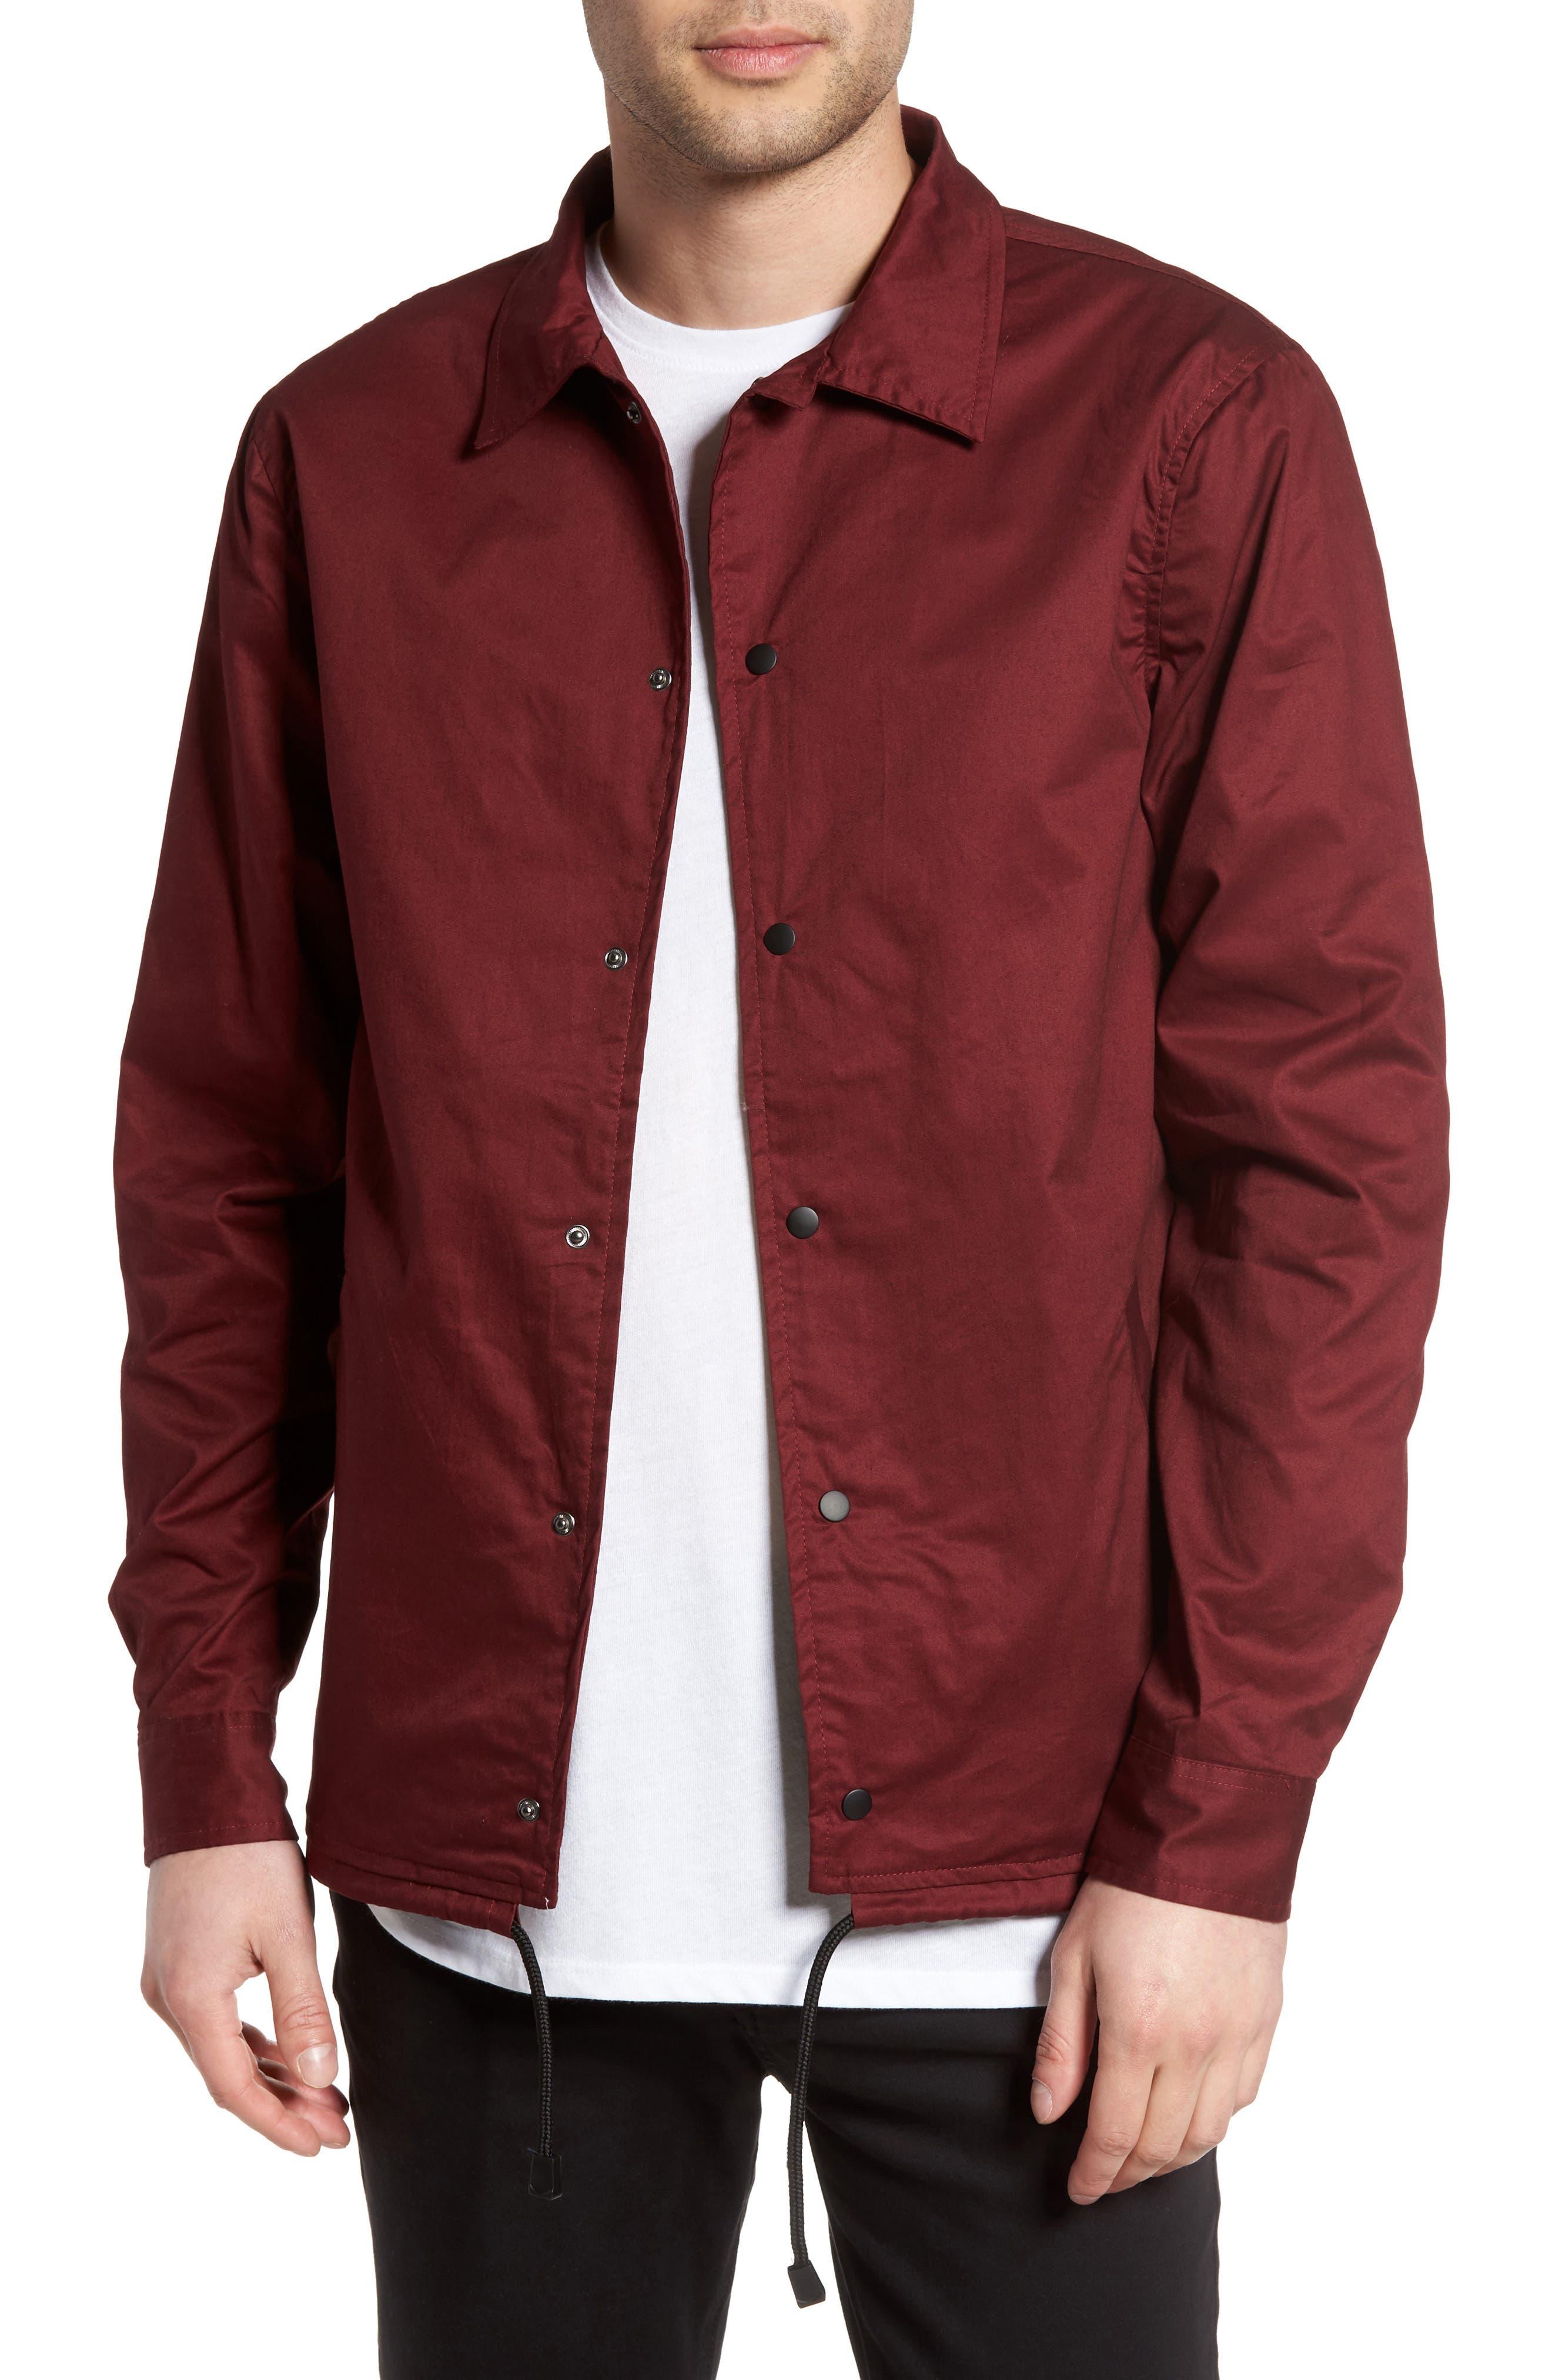 Z.A.K. Brand Sanford Slim Fit Coach's Jacket